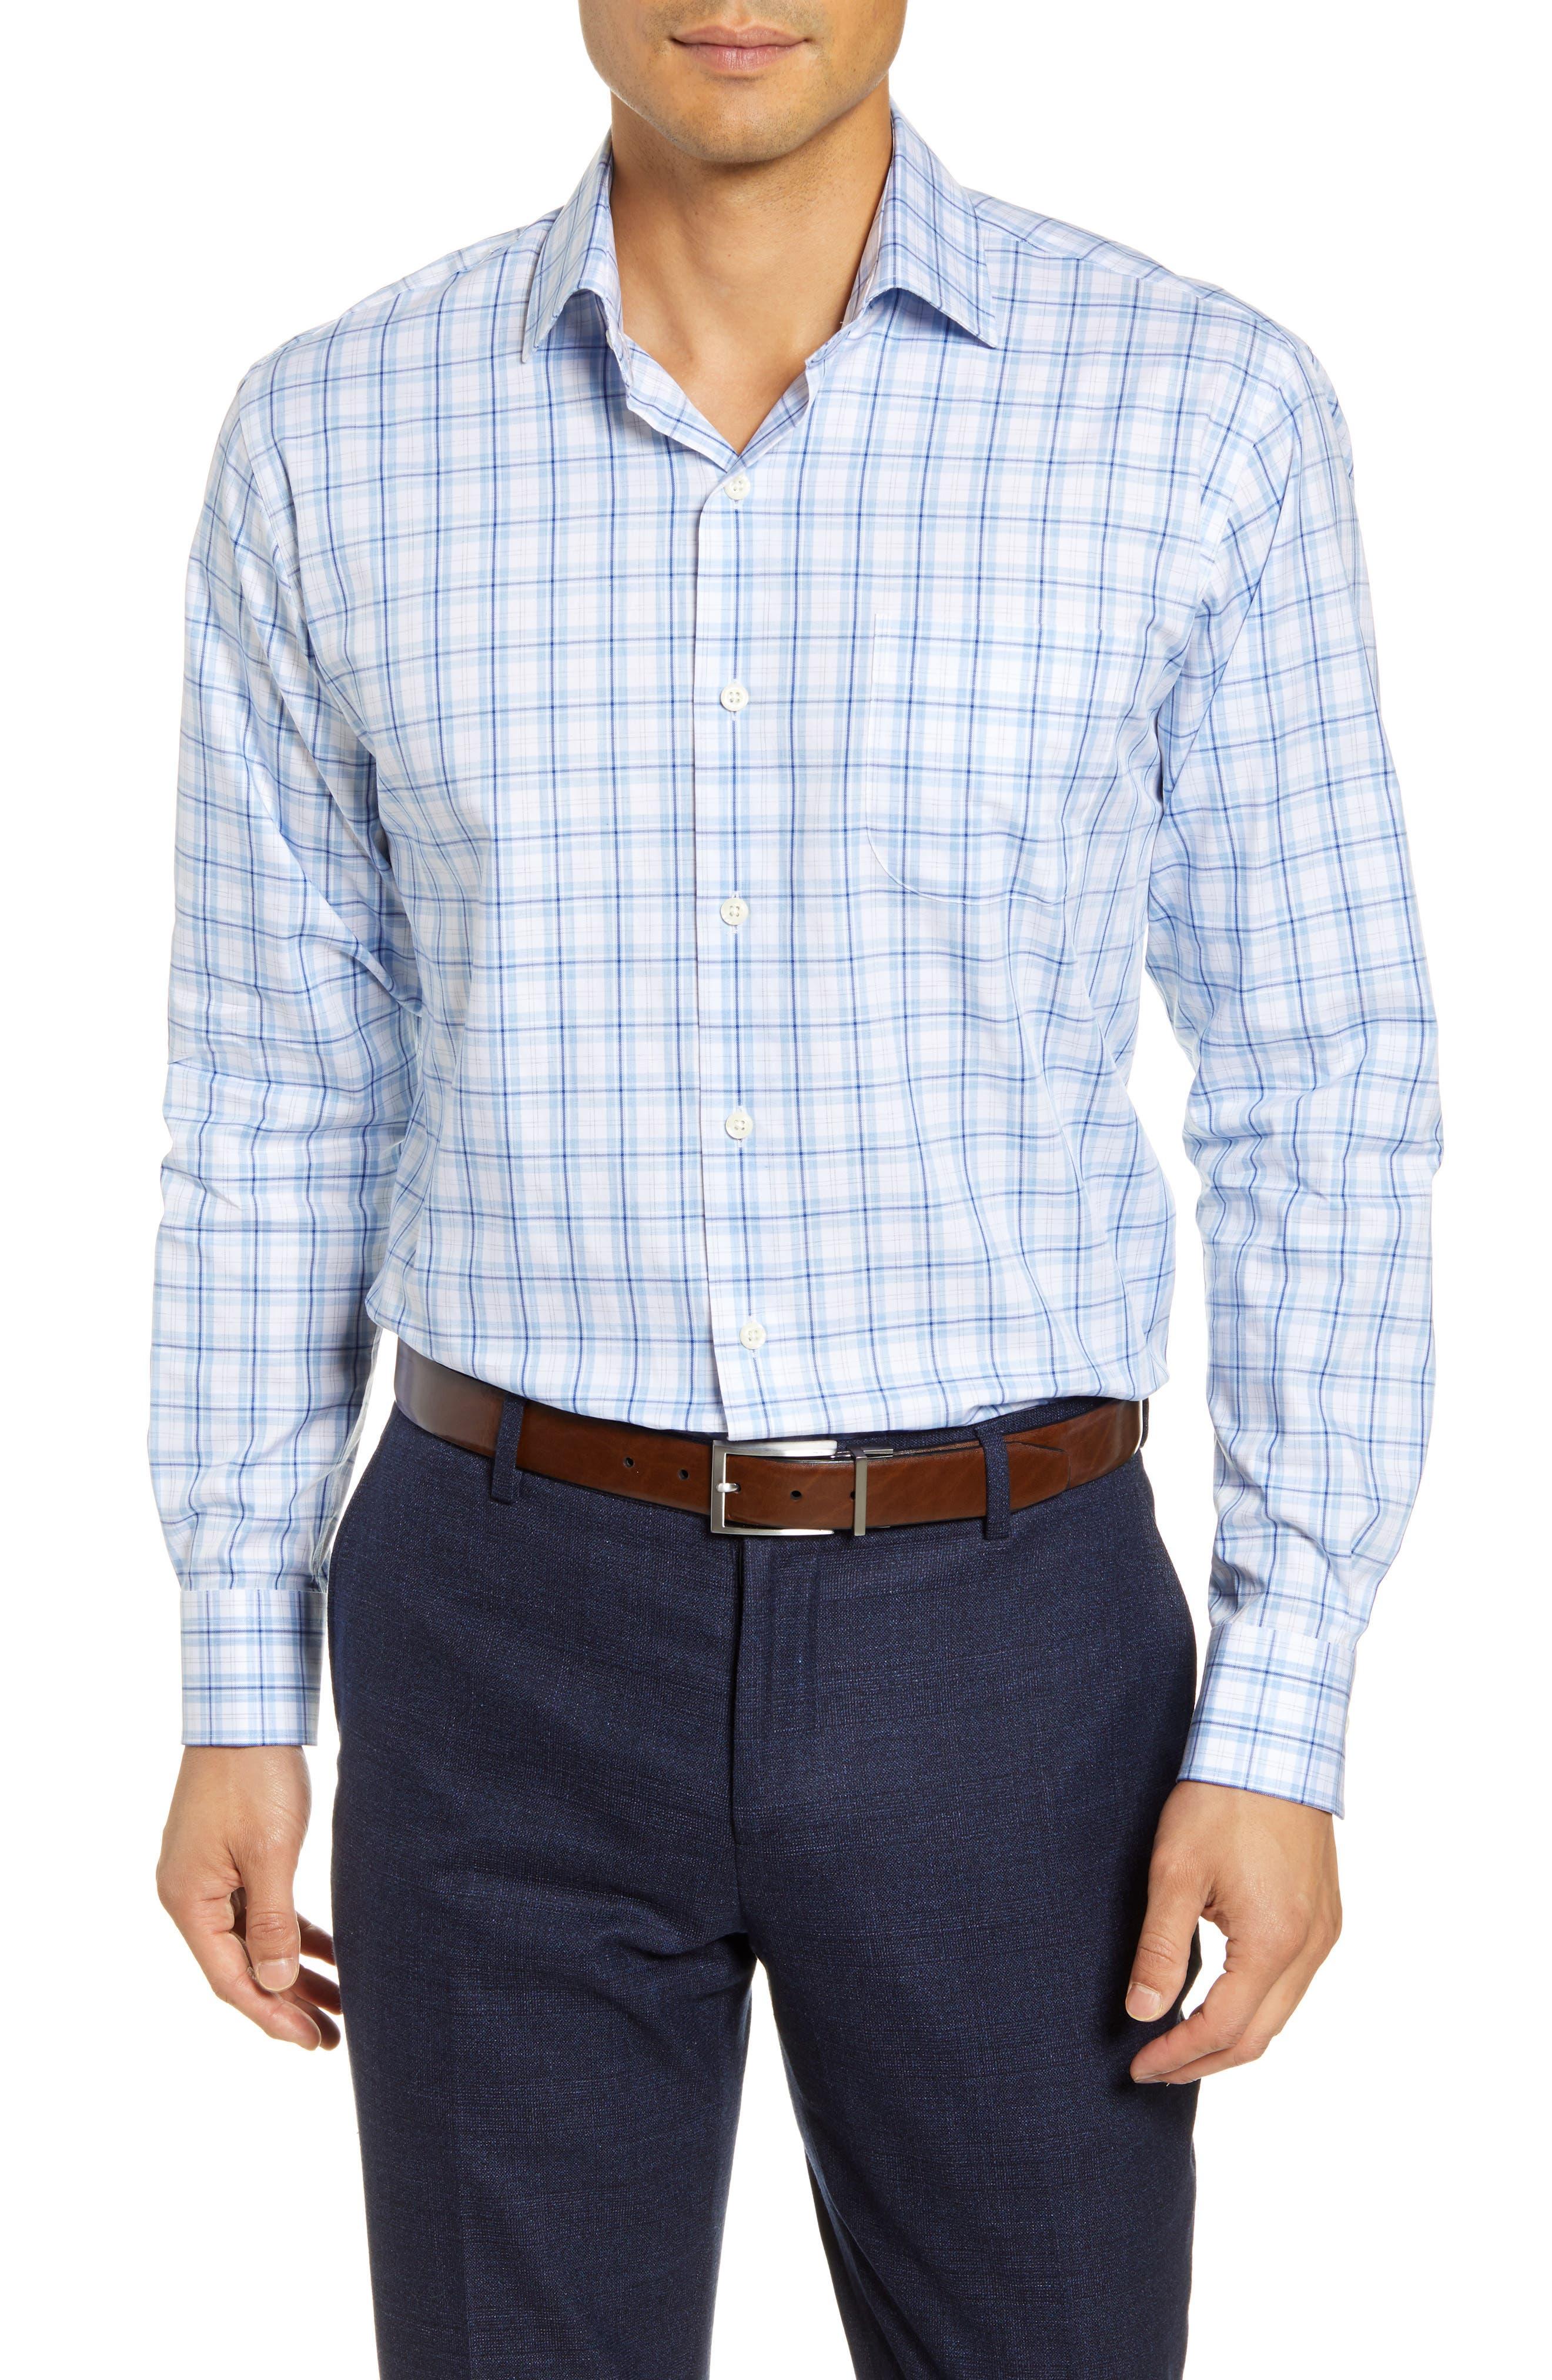 Image of Peter Millar Warren Regular Fit Tartan Plaid Shirt